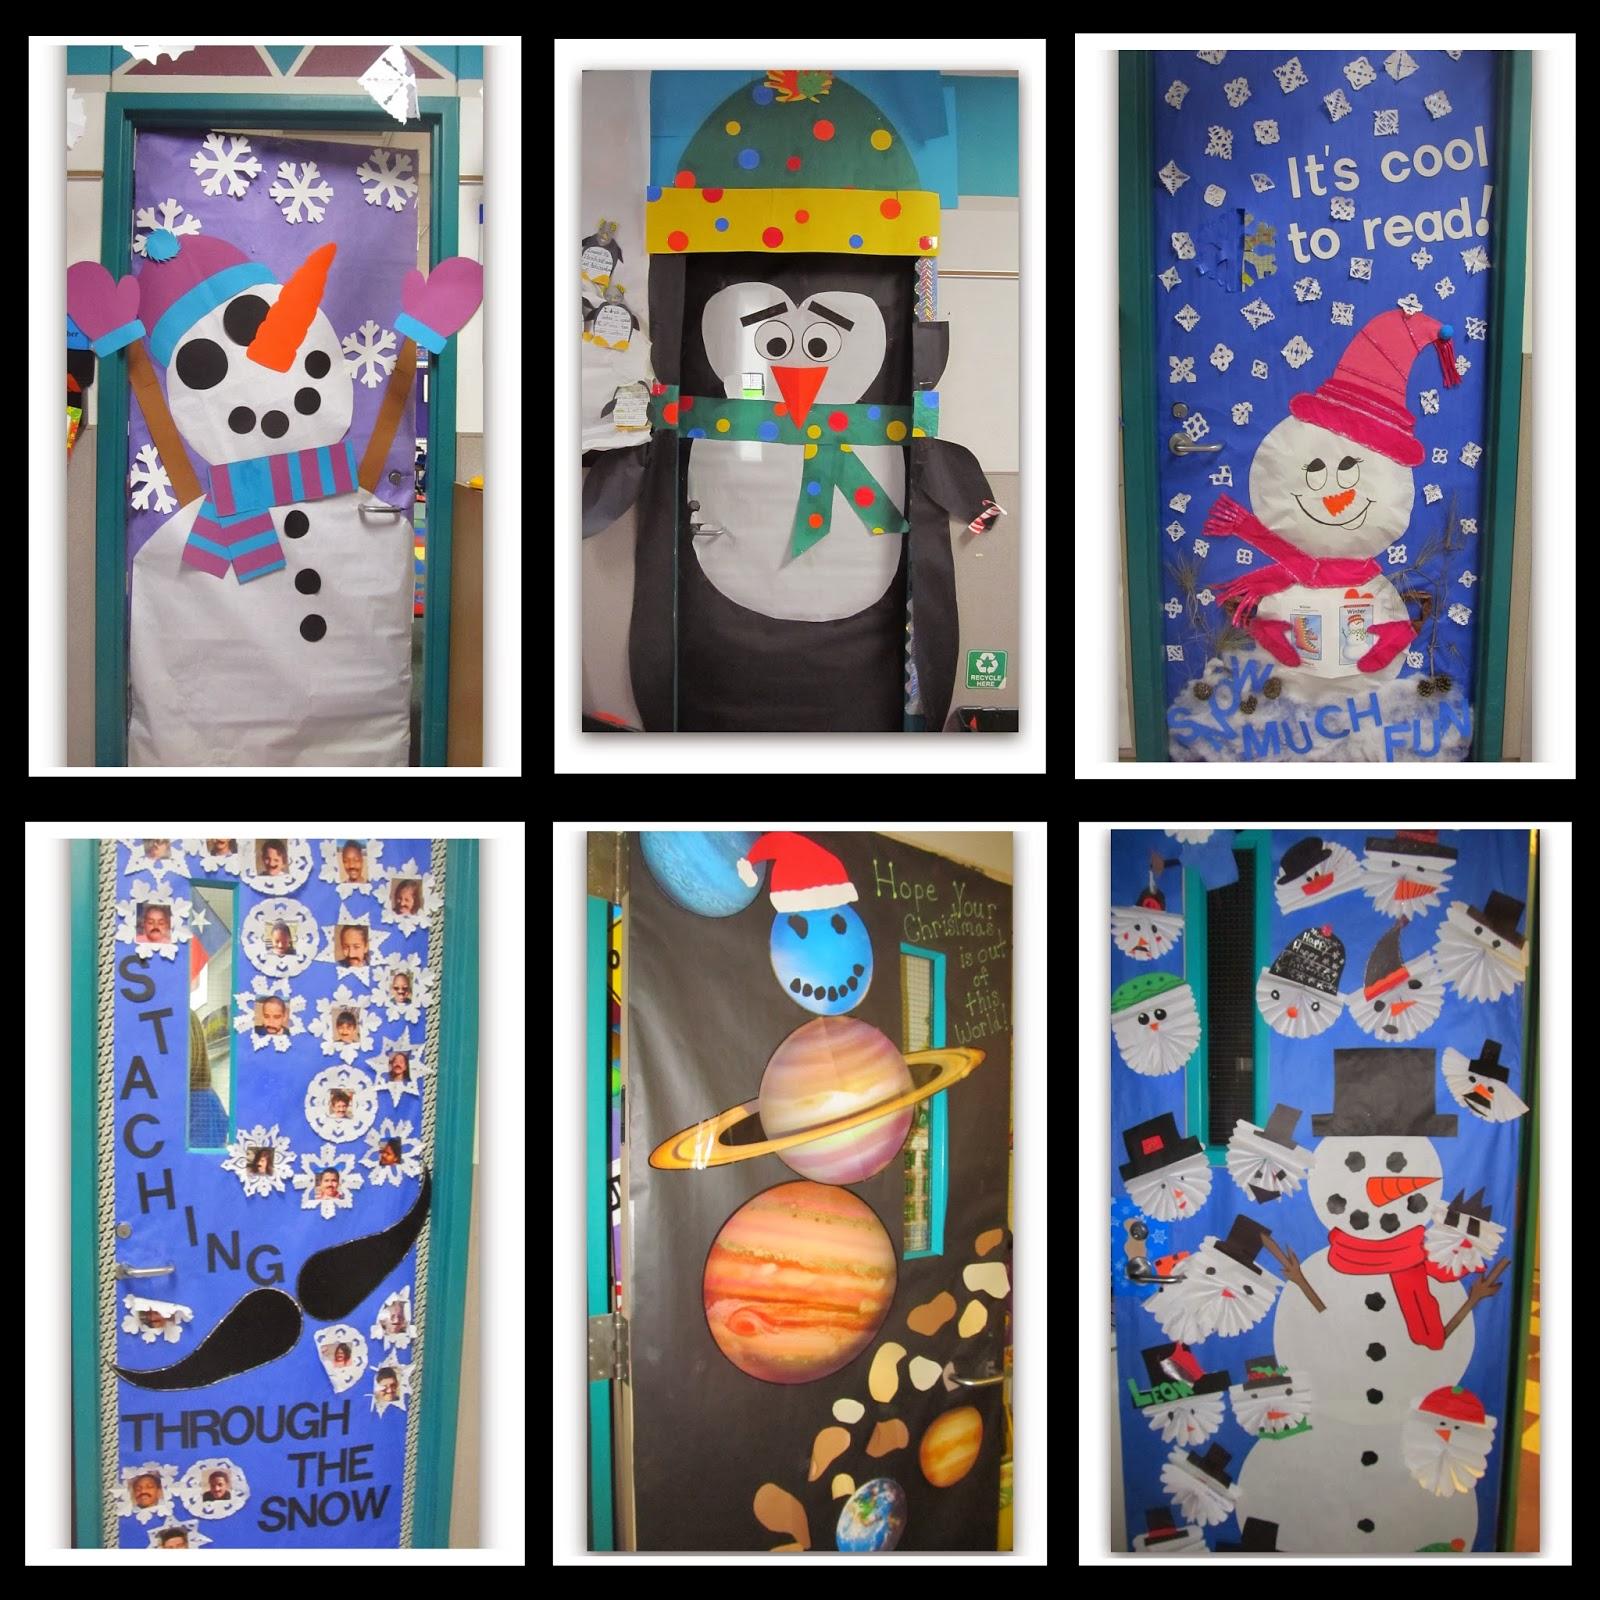 Winter Season Classroom Decorations ~ Rainbowswithinreach winter themed decorated classroom doors